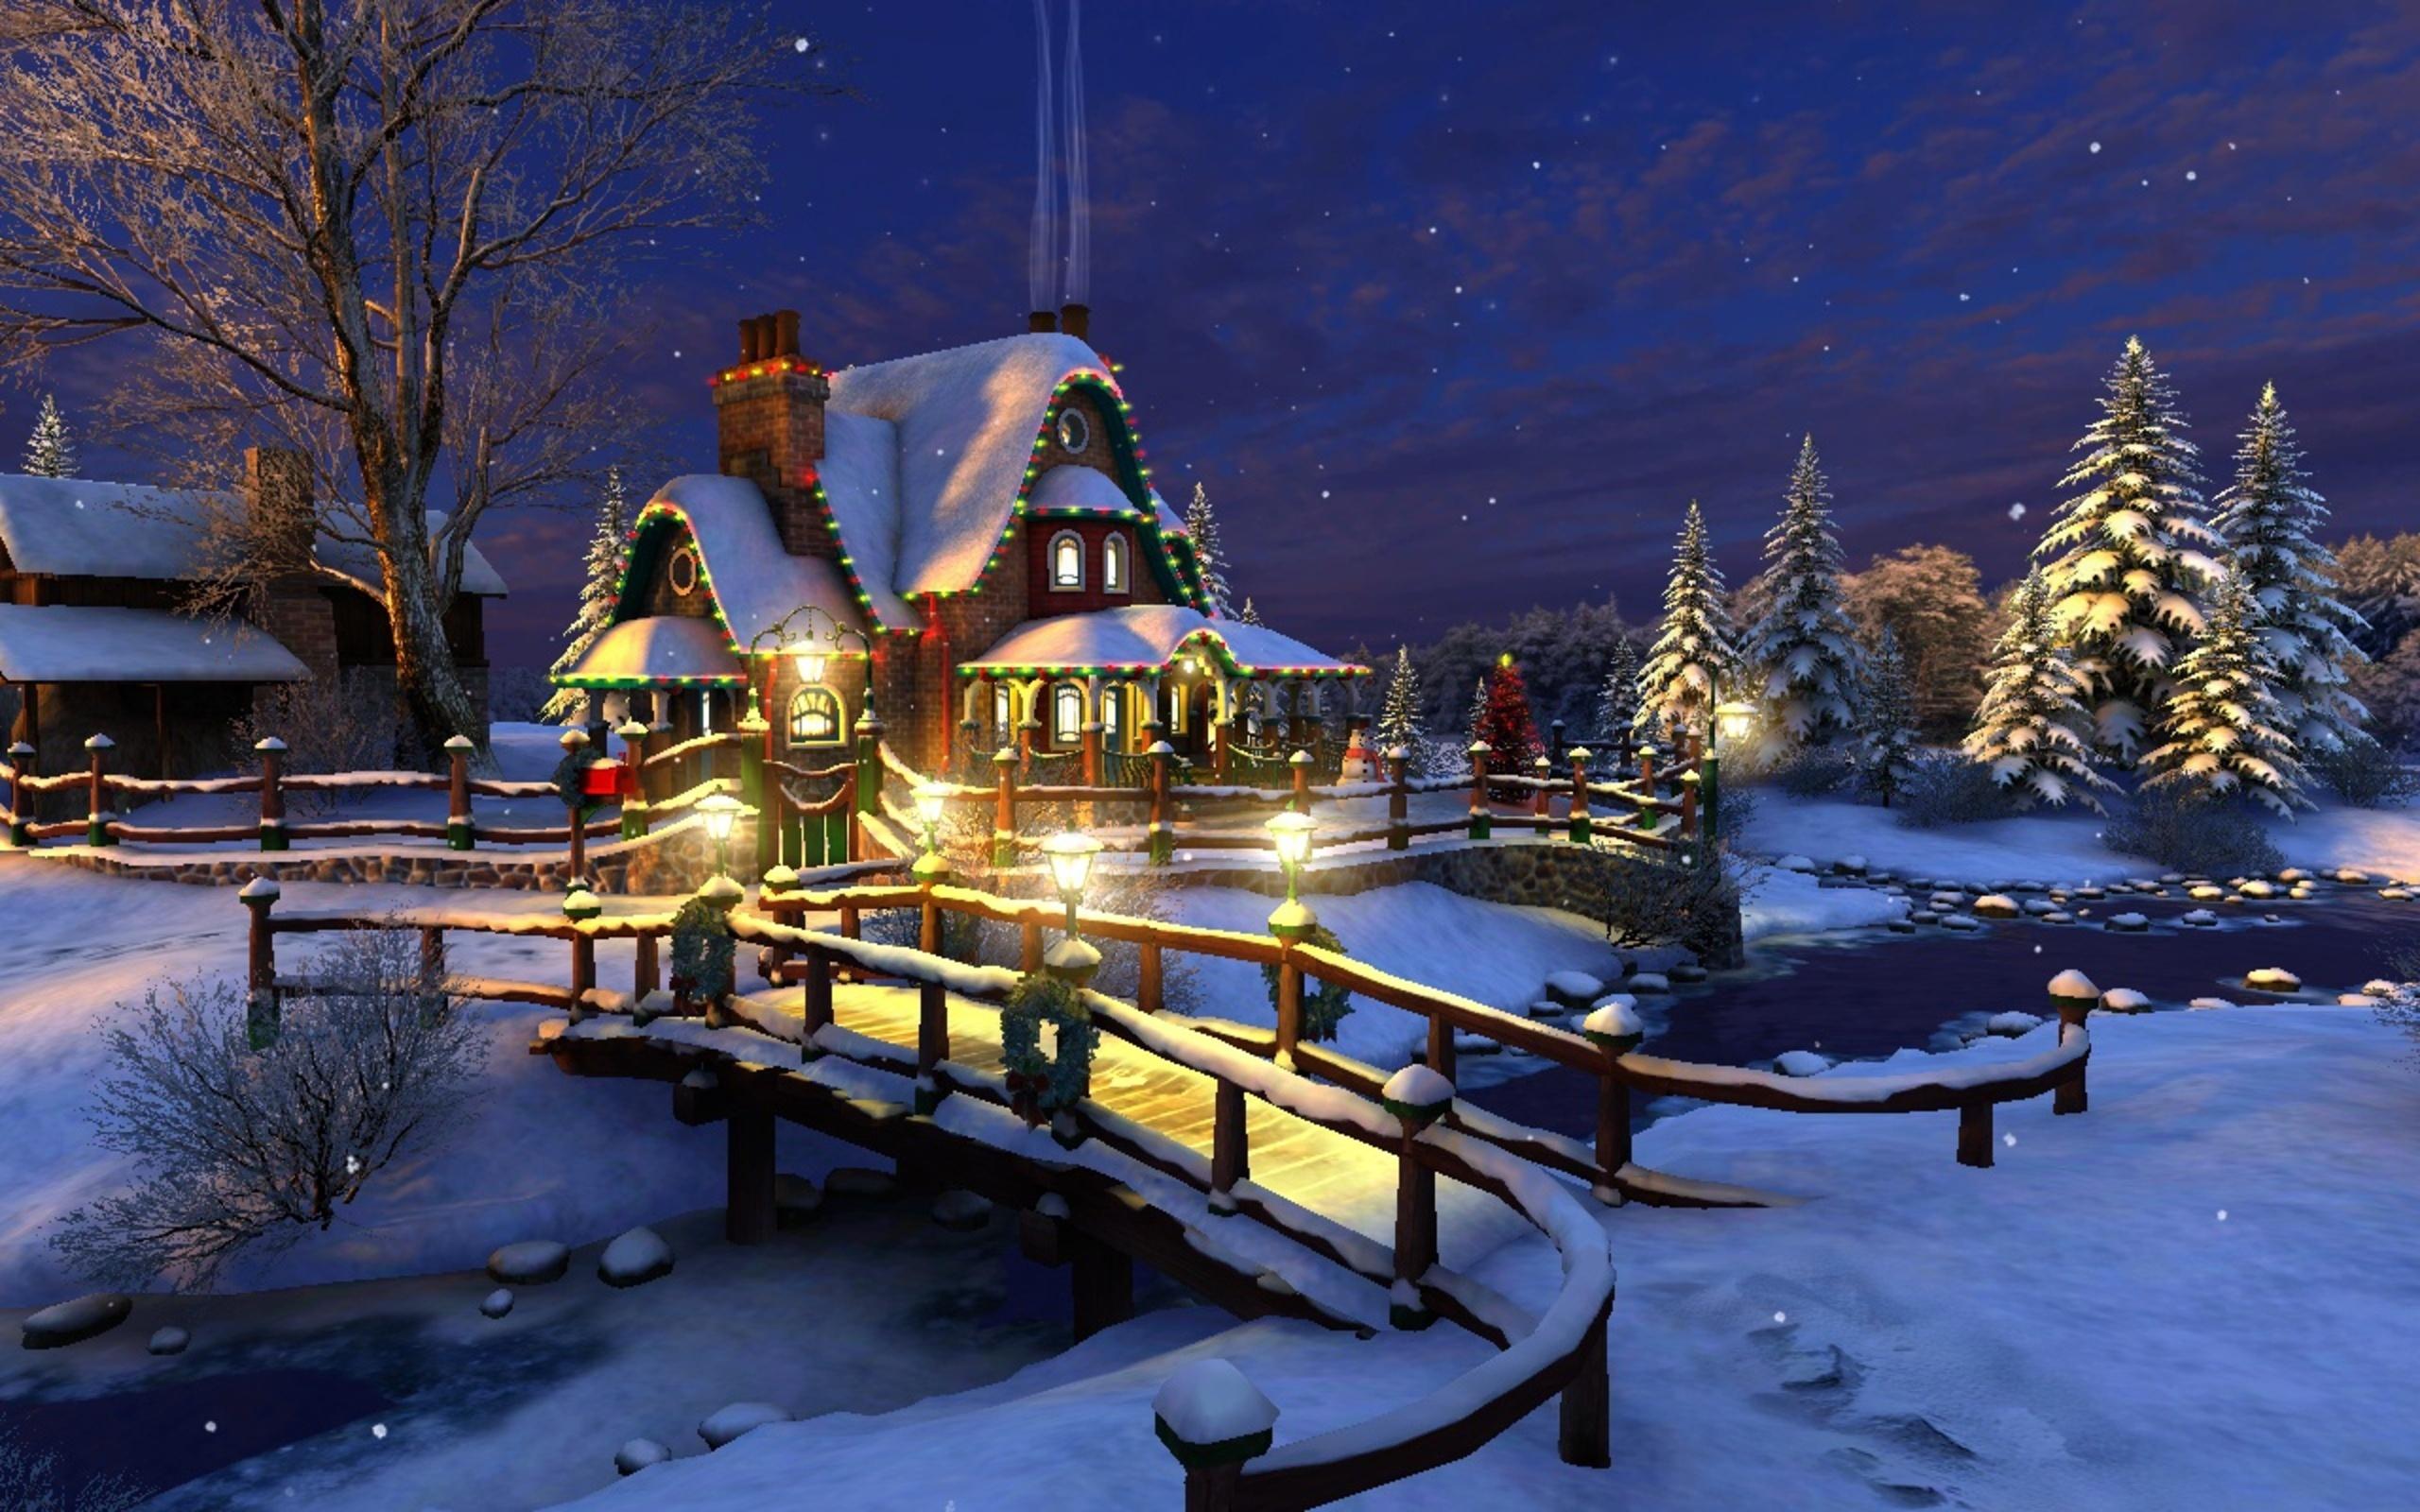 night snow lodge winter wallpaper 90696 2560x1600px. Black Bedroom Furniture Sets. Home Design Ideas